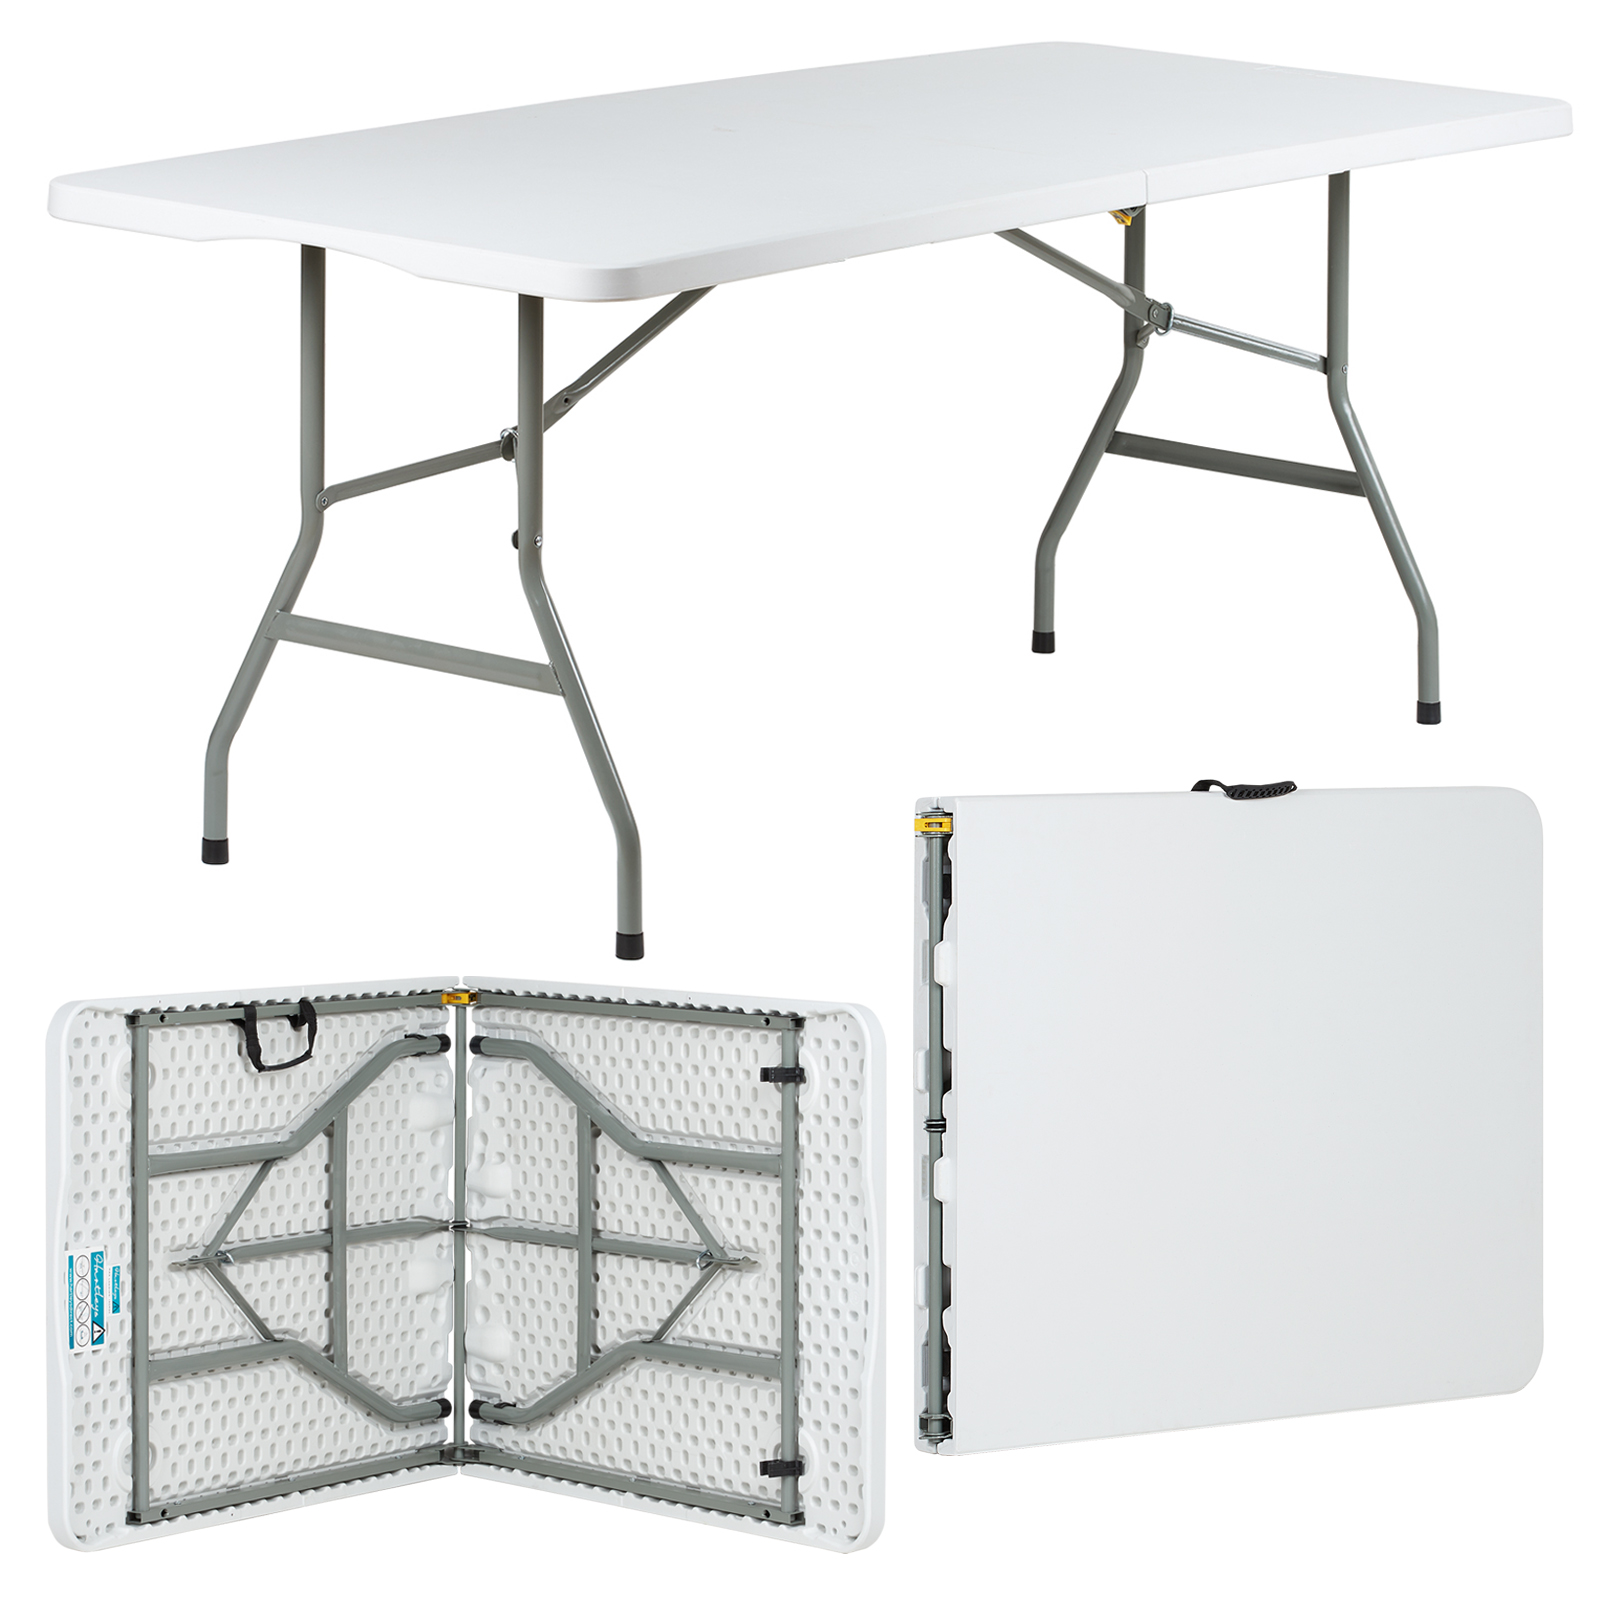 Tavoli Da Mercato Pieghevoli.6ft Folding Table Stall Market Fete Fair Art Camping Tradeshow